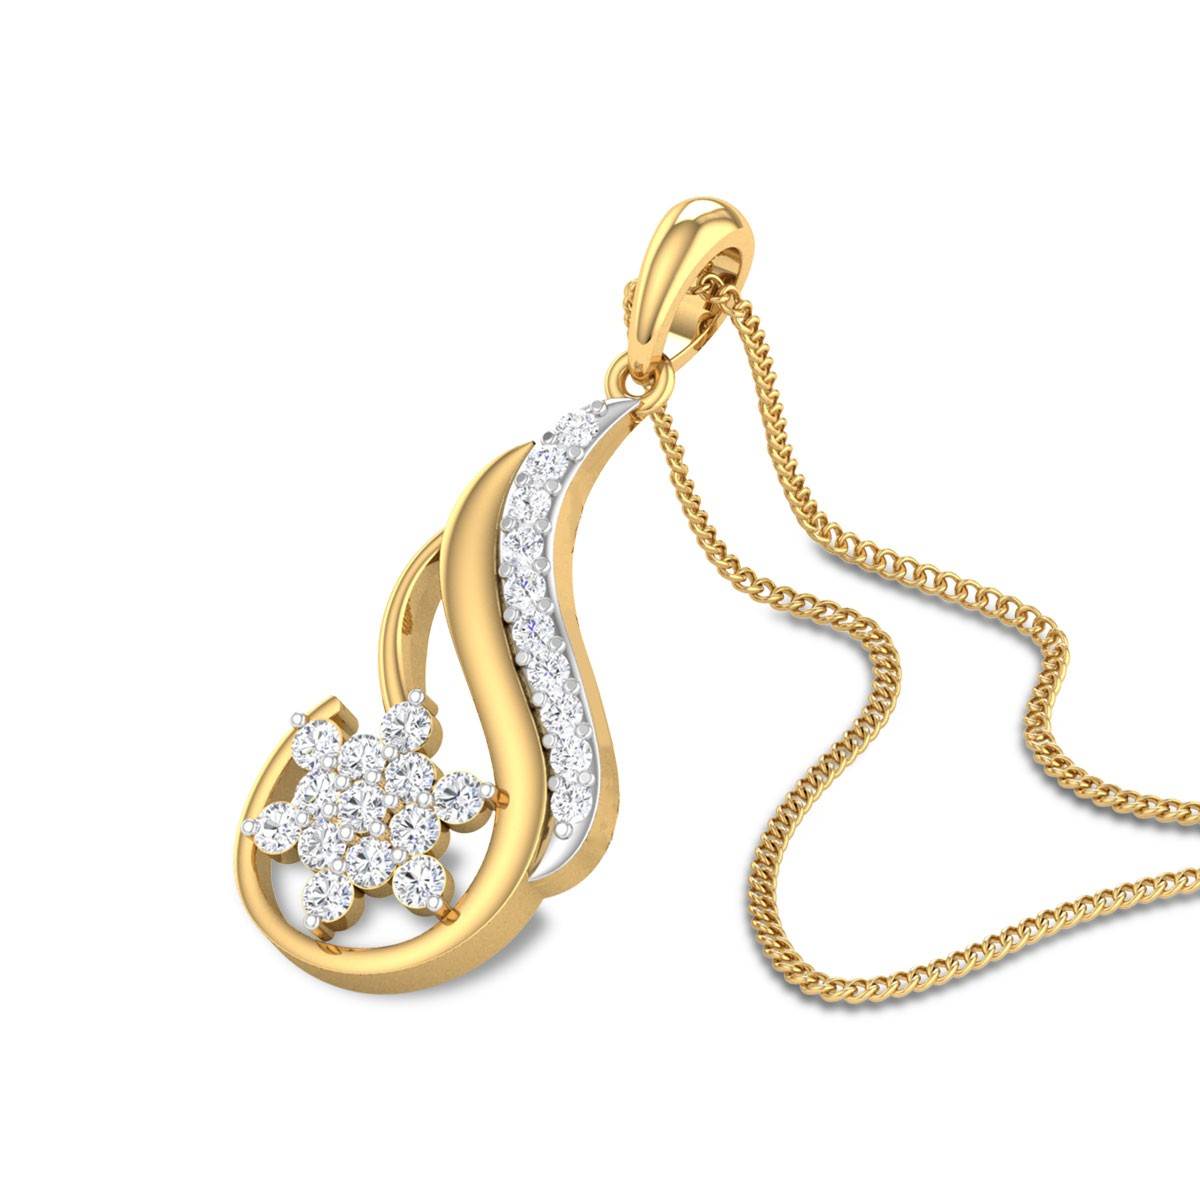 Marlow Floral Diamond Pendant